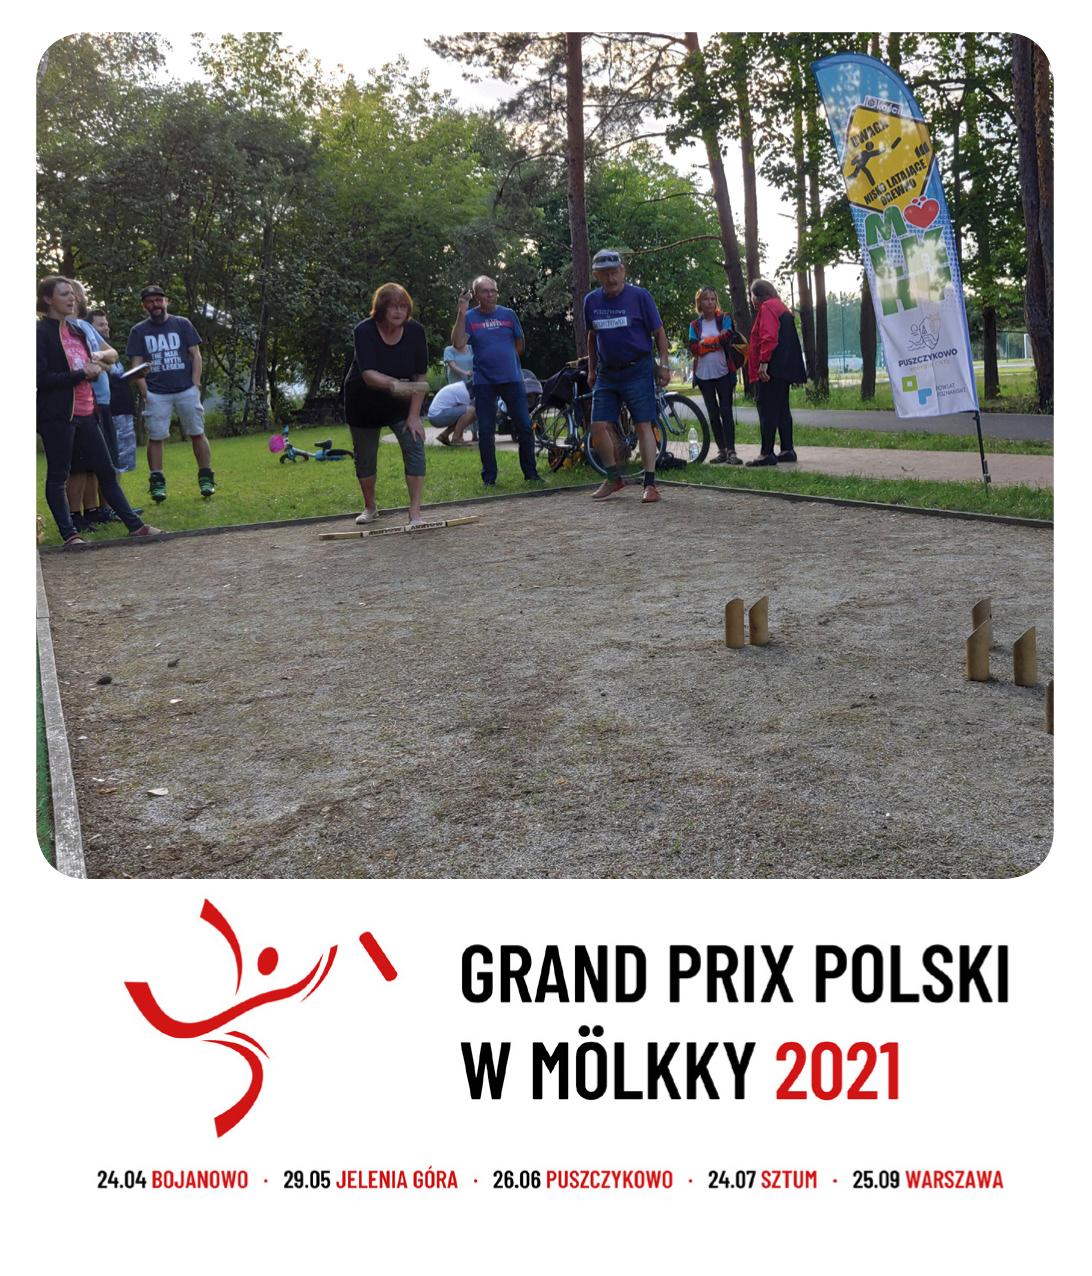 Grand Prix Polski w Mölkky